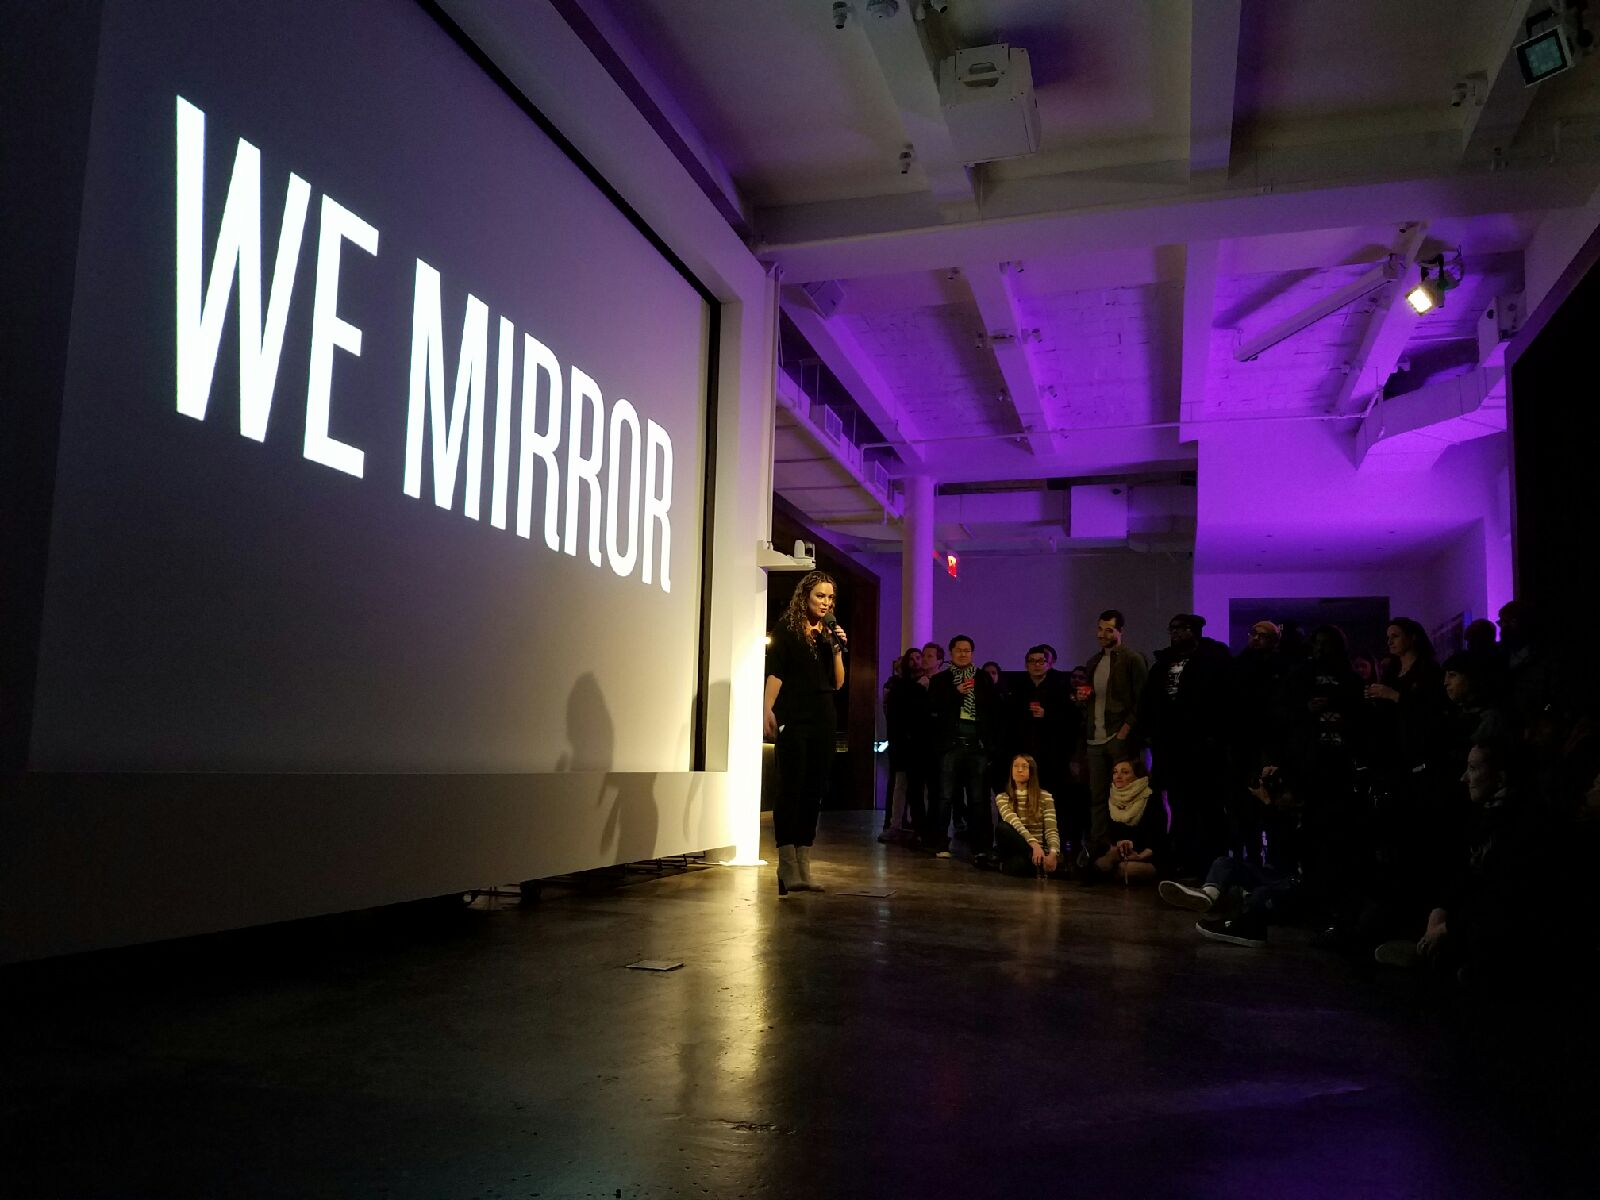 Joy Sela, The Four Pllars Launch, We Mirror, Positive Disruption